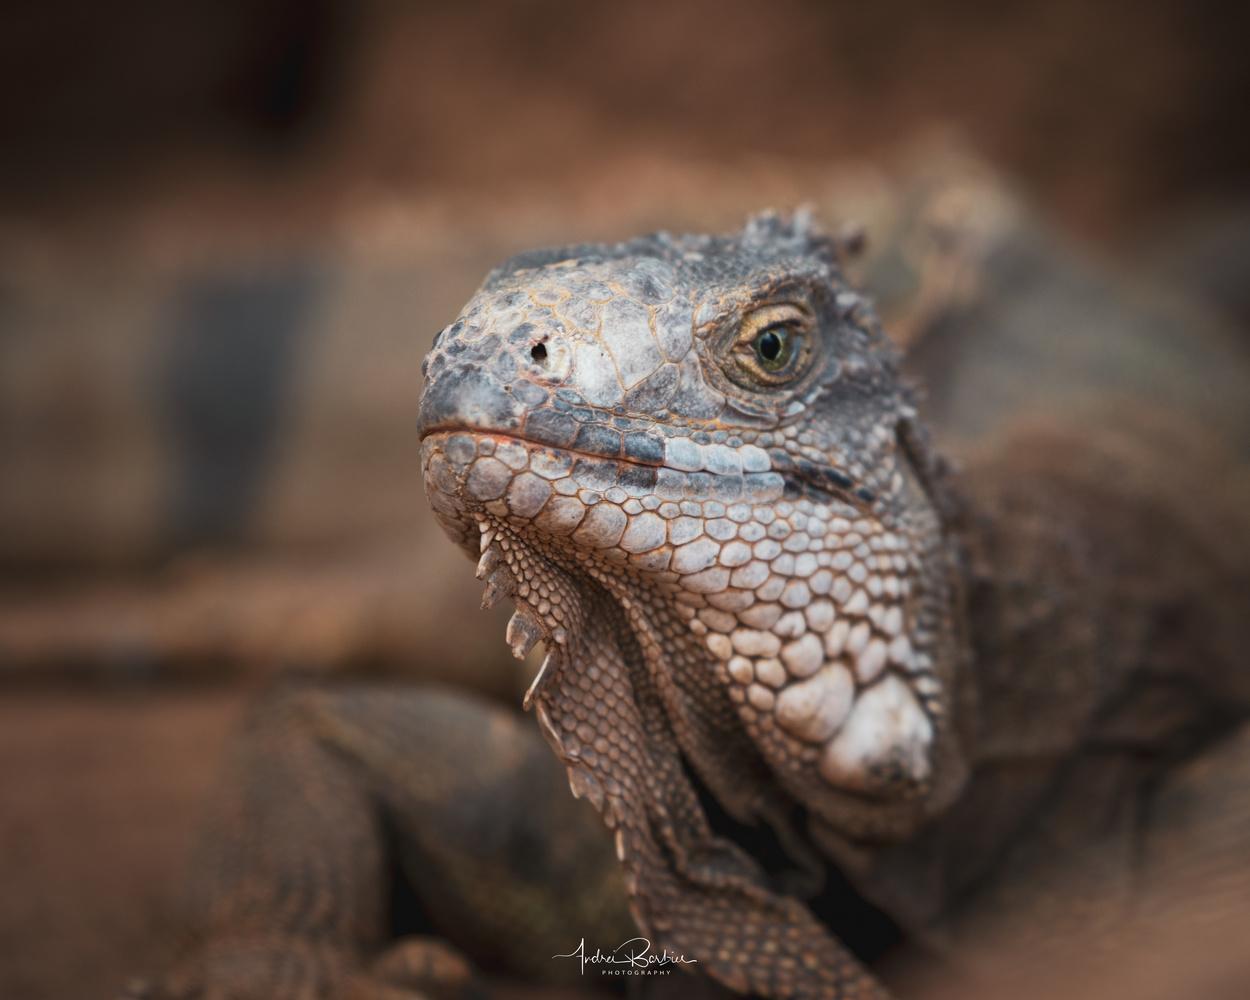 Iguana by Andrei Barbier